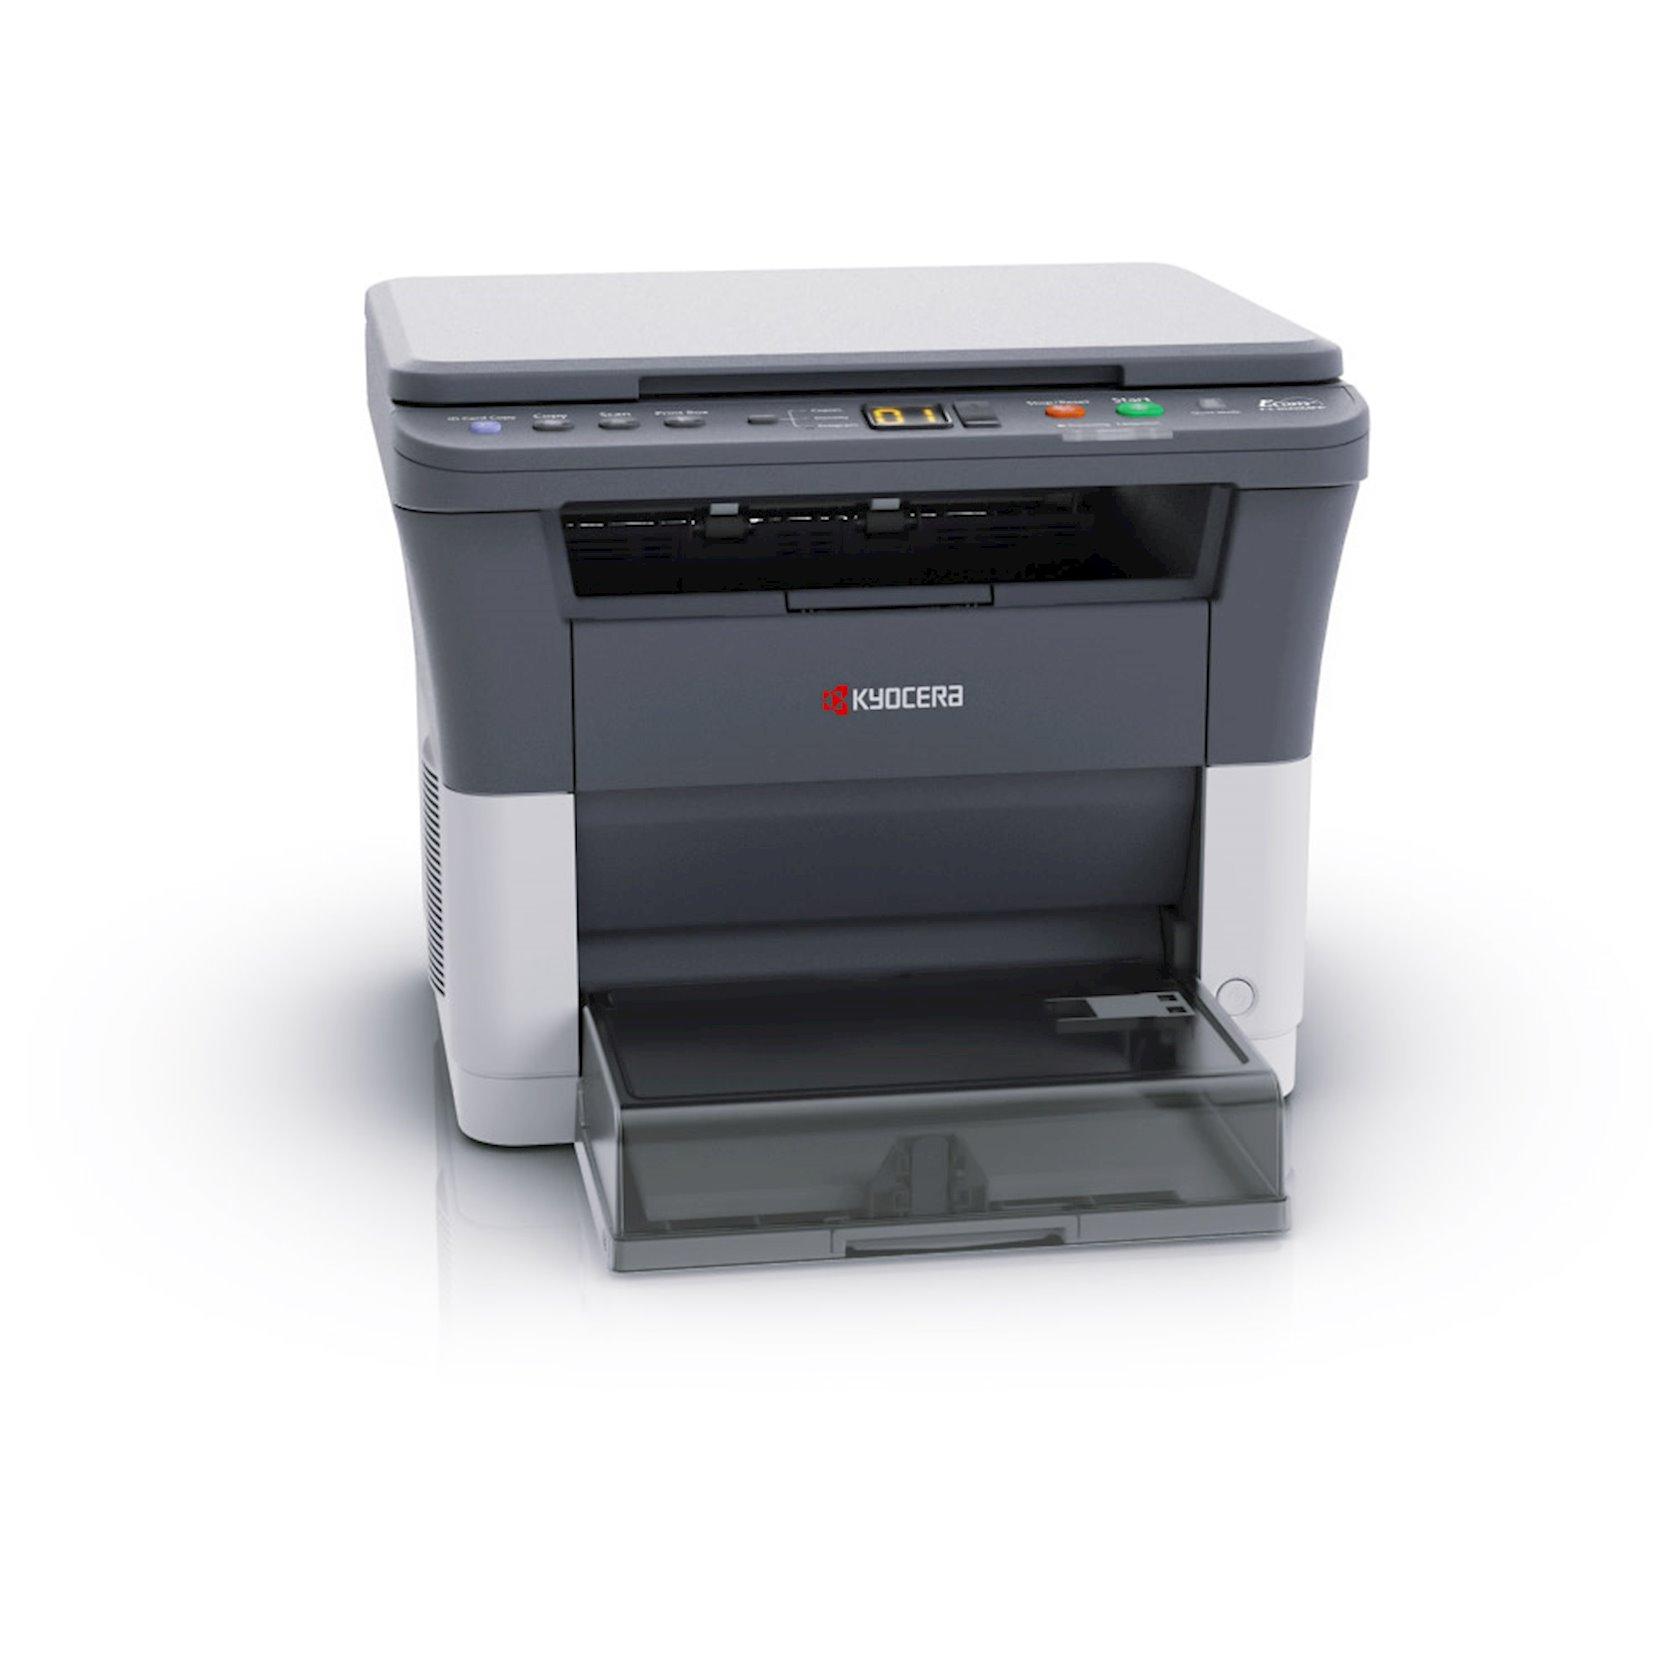 Printer Kyocera Ecosys FS-1020MFP